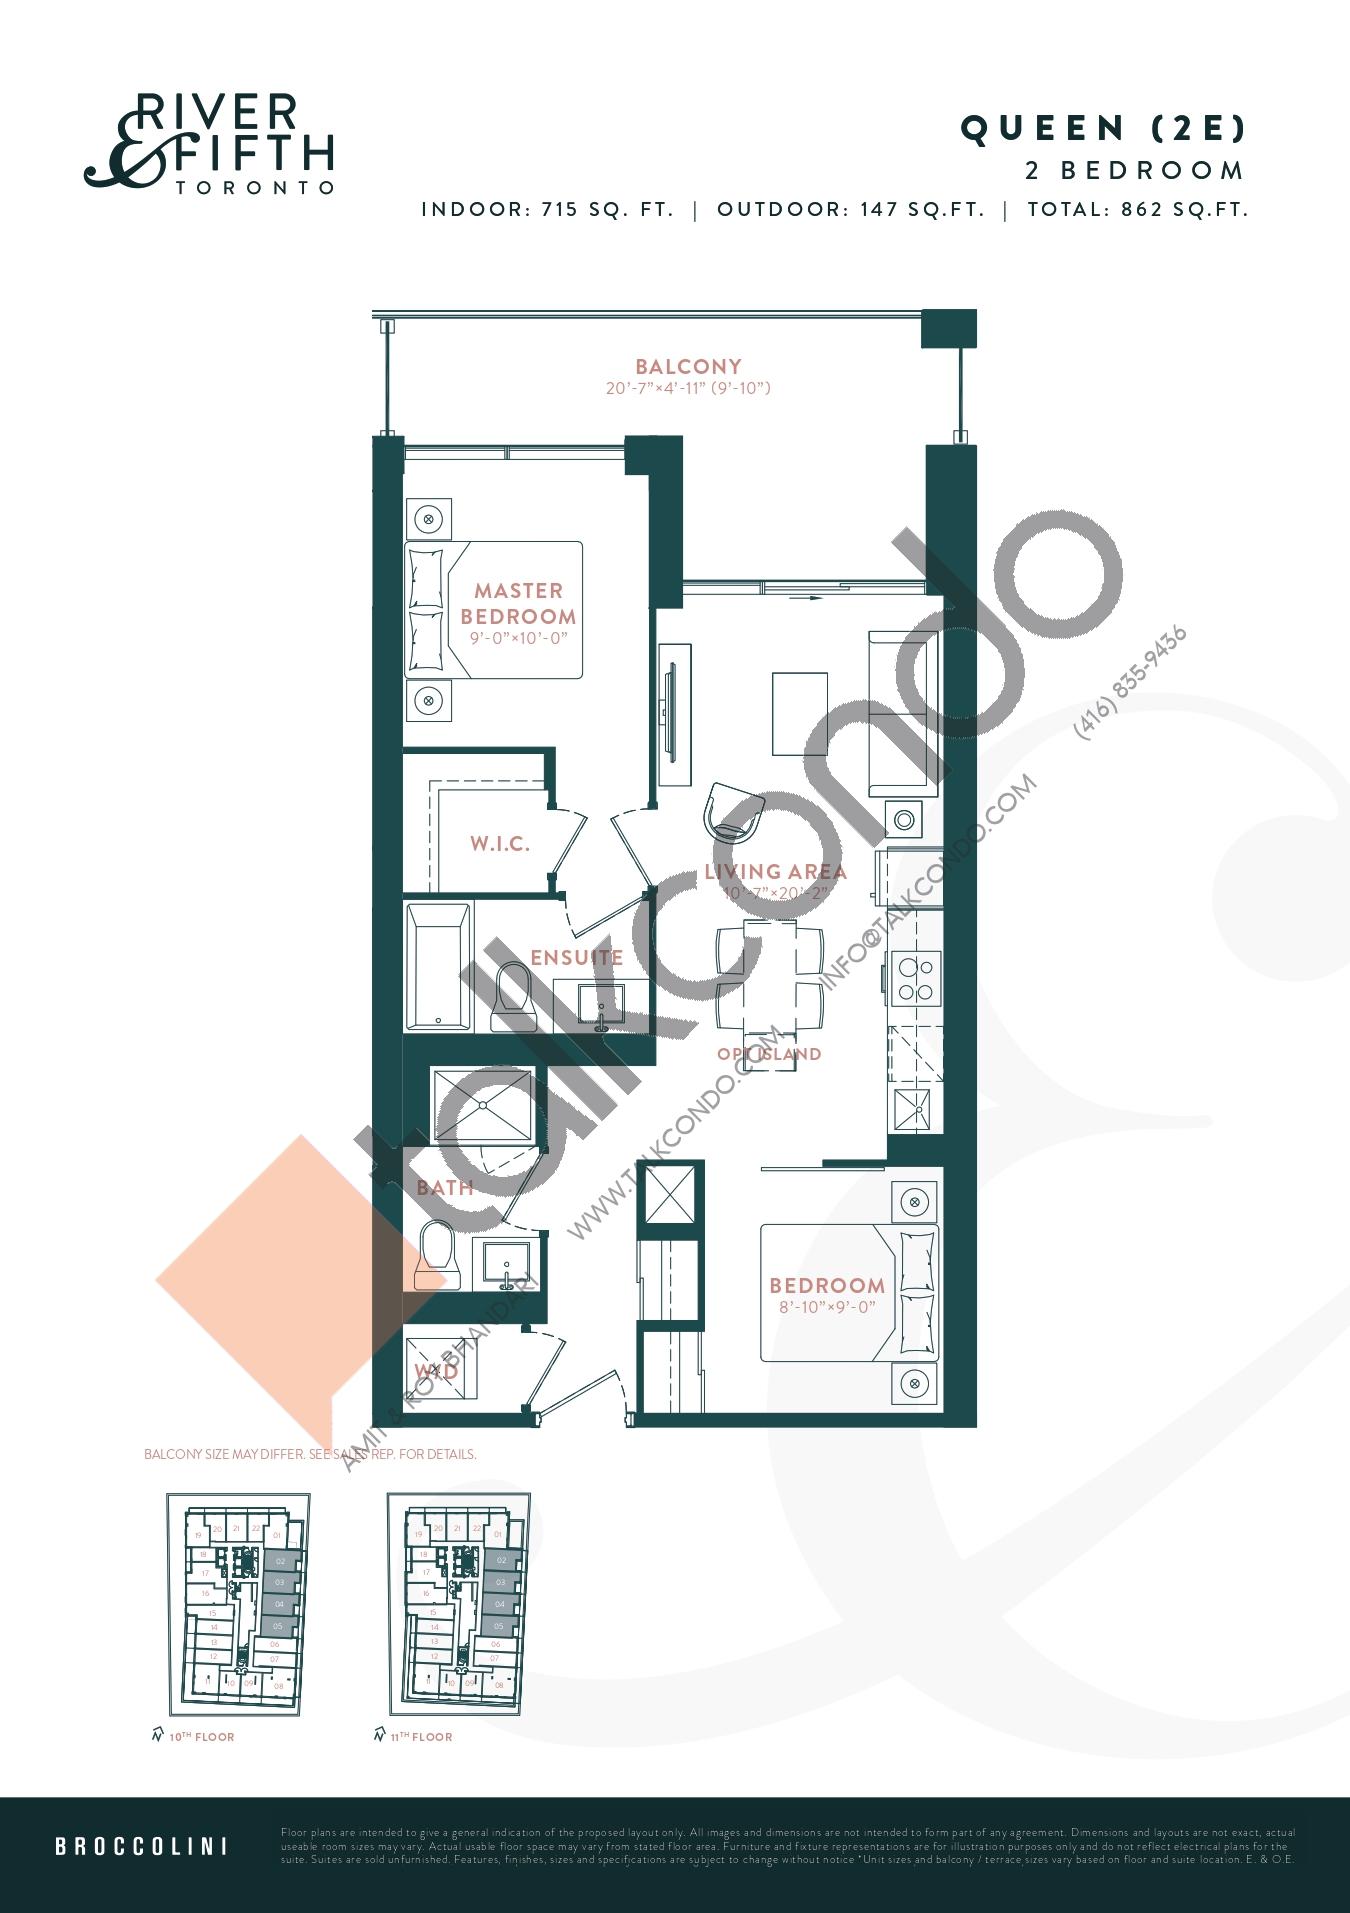 Queen (2E) Floor Plan at River & Fifth Condos - 715 sq.ft